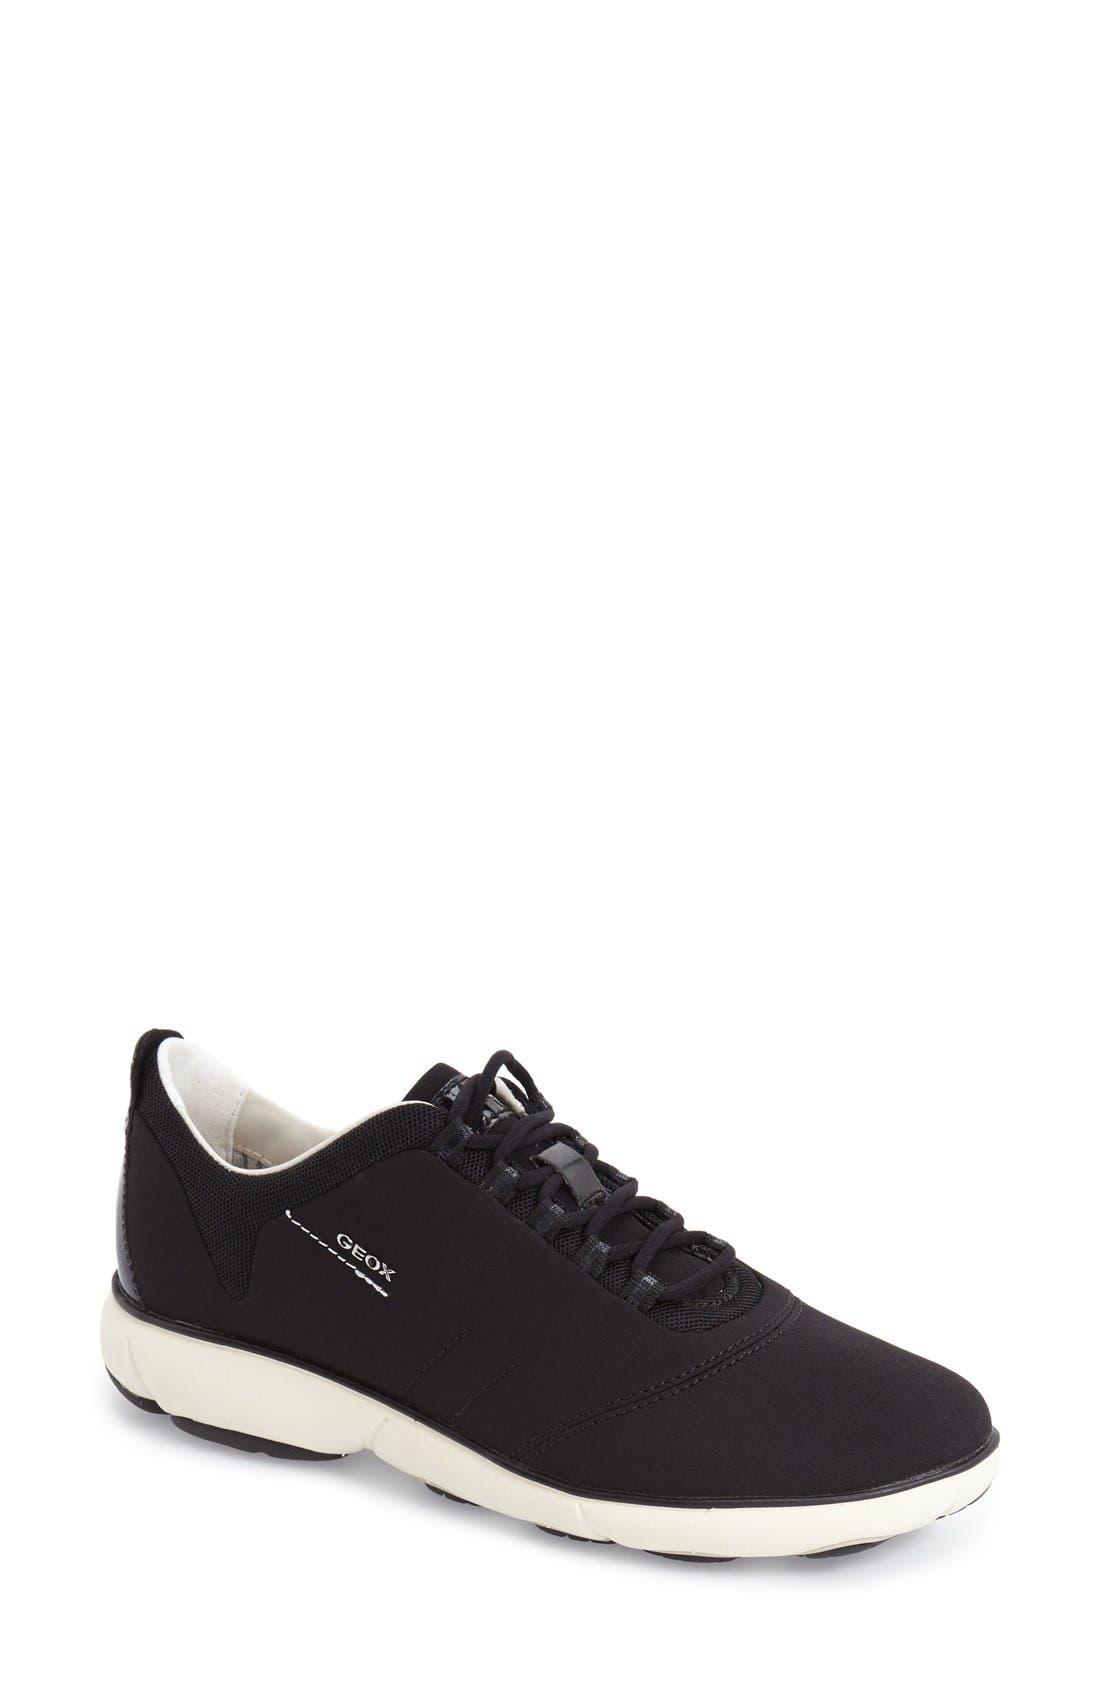 Nebula Slip-On Sneaker,                         Main,                         color, 001